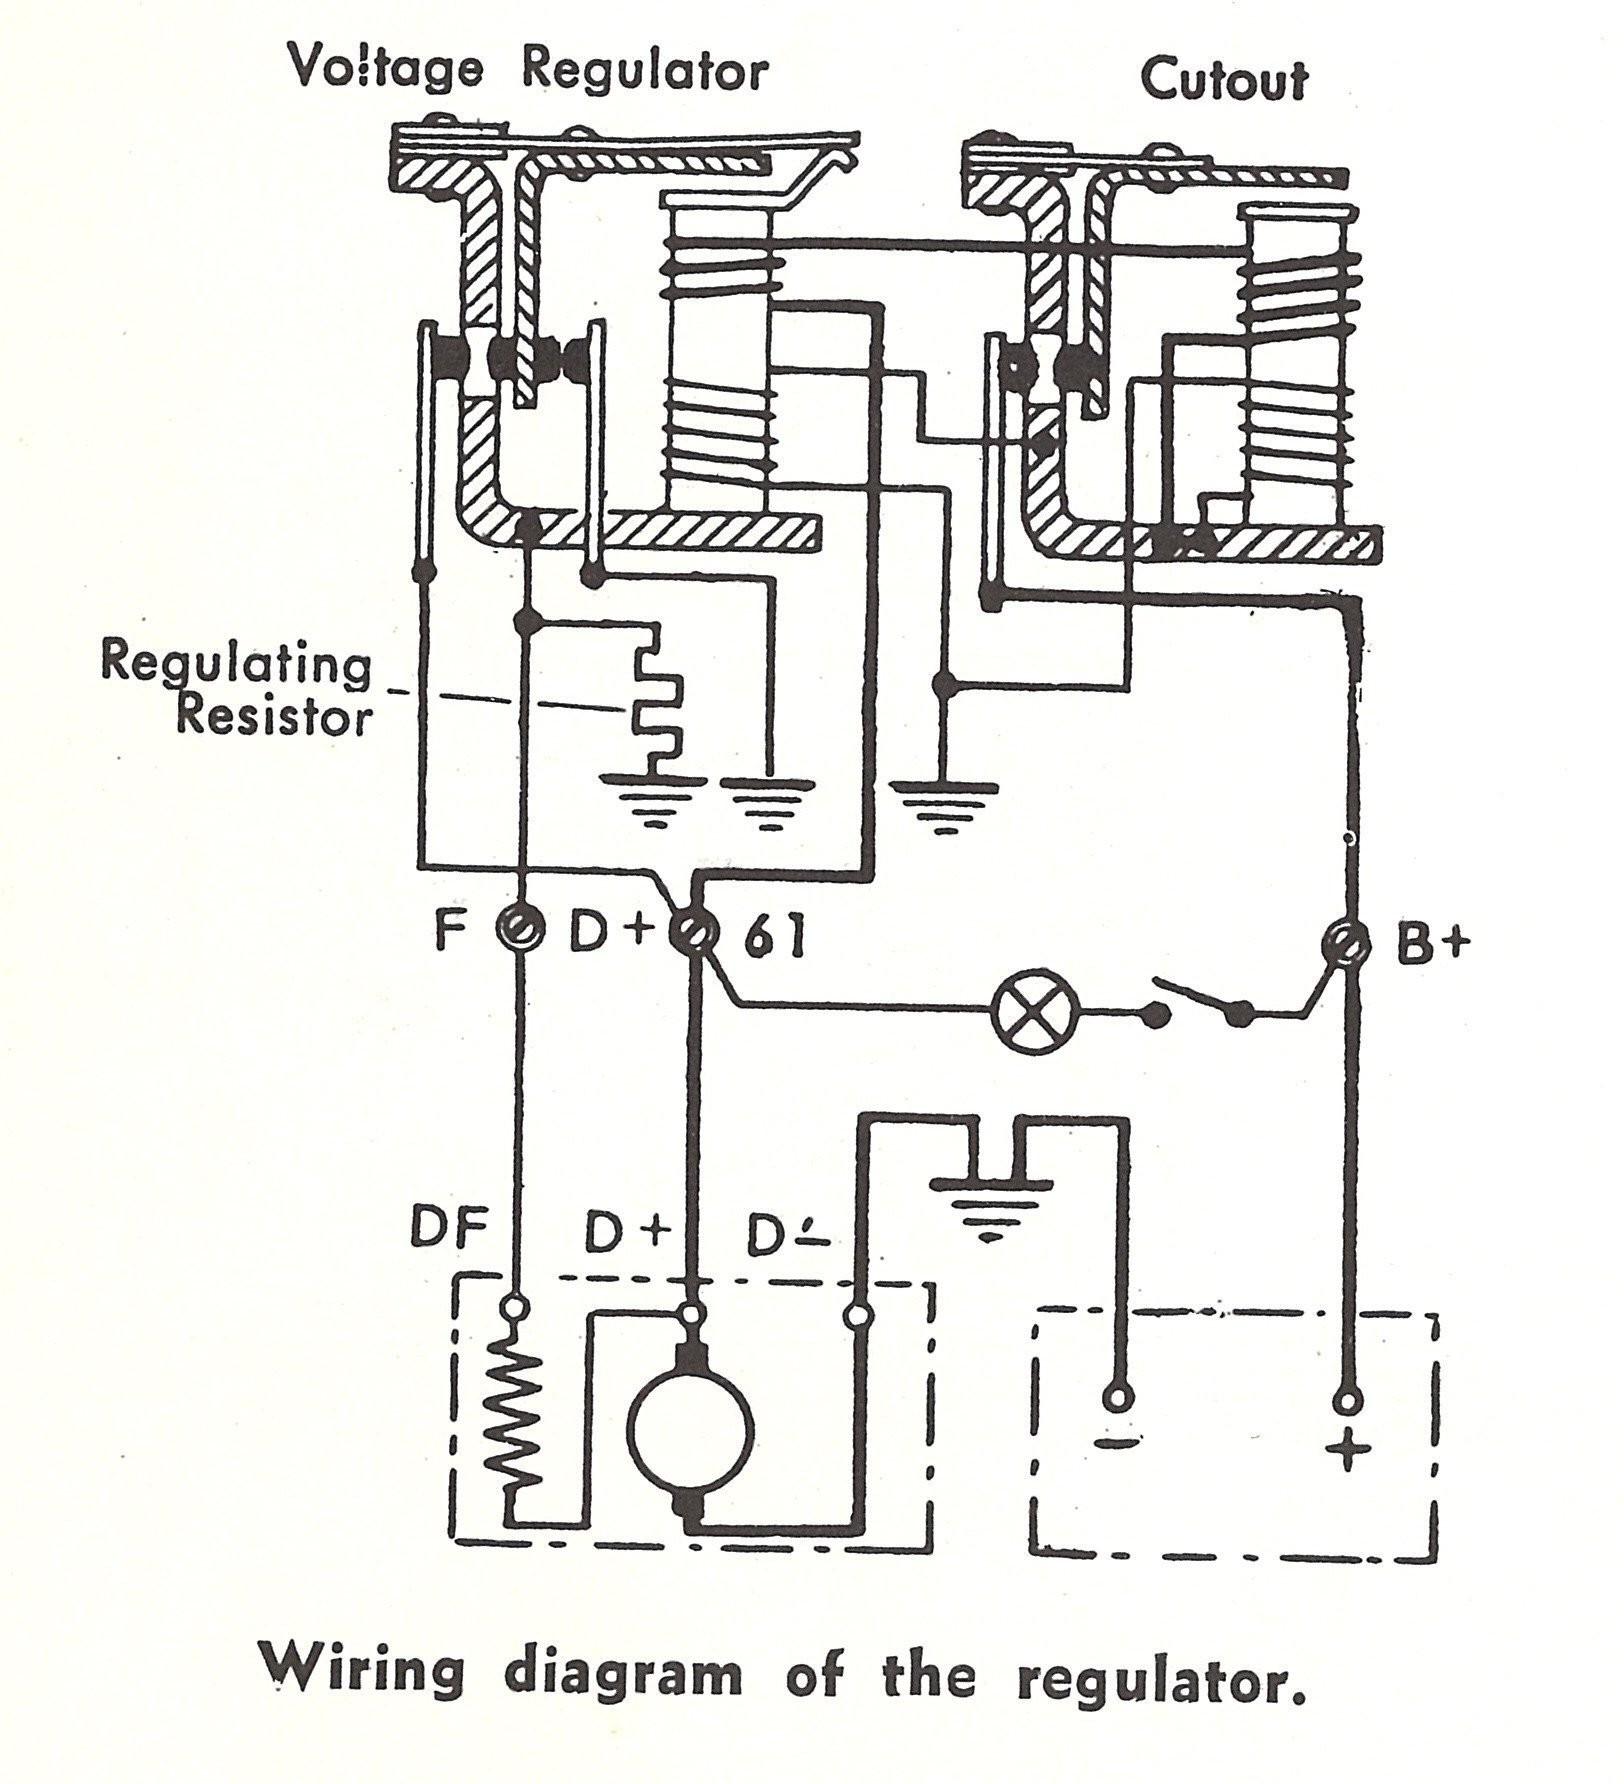 Kohler Voltage Regulator Wiring Diagram